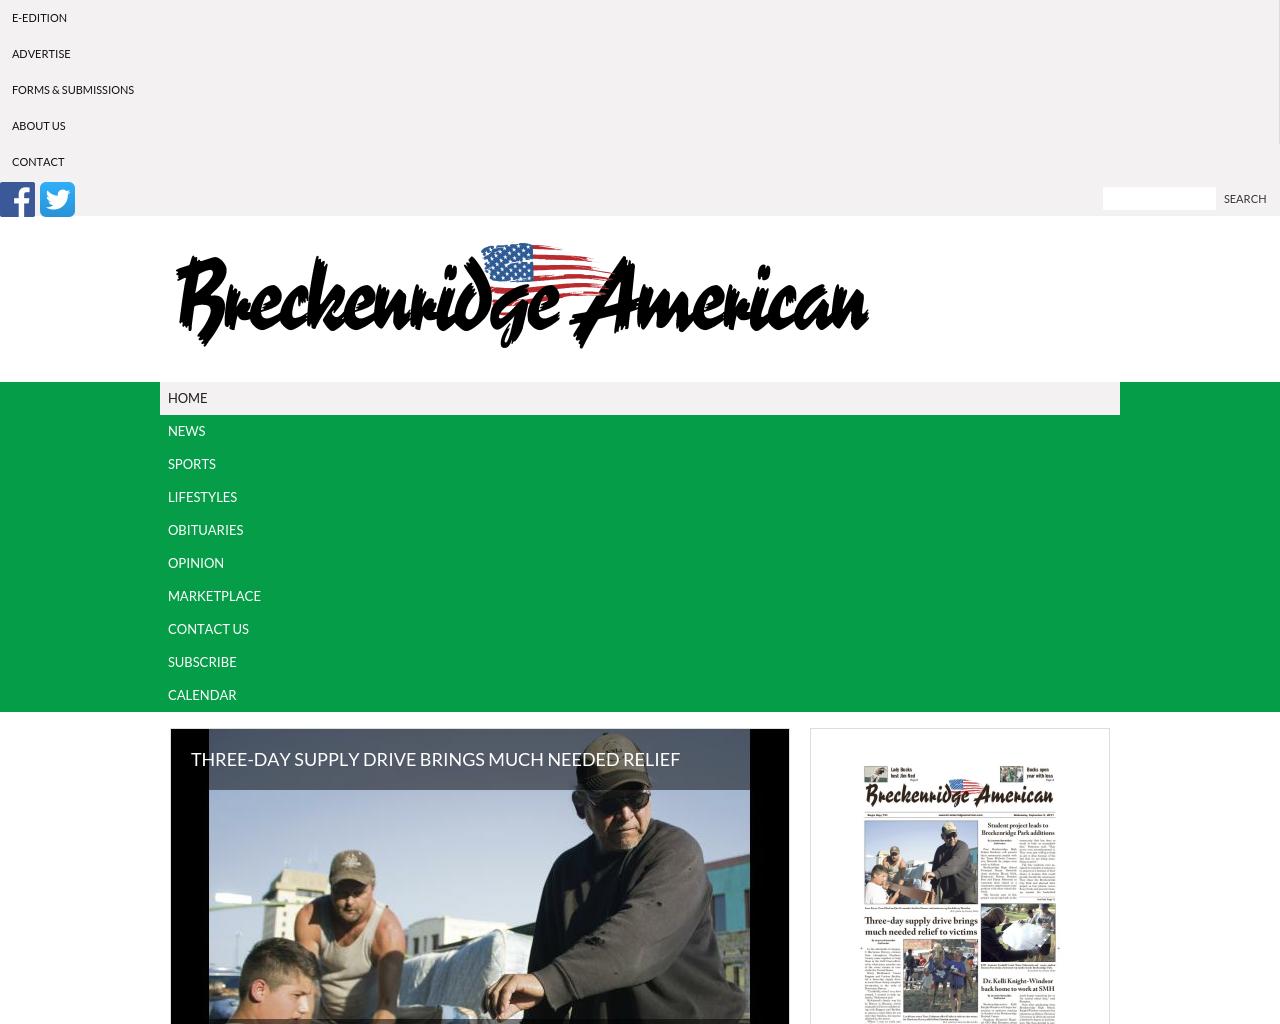 Breckenridge-American-Advertising-Reviews-Pricing